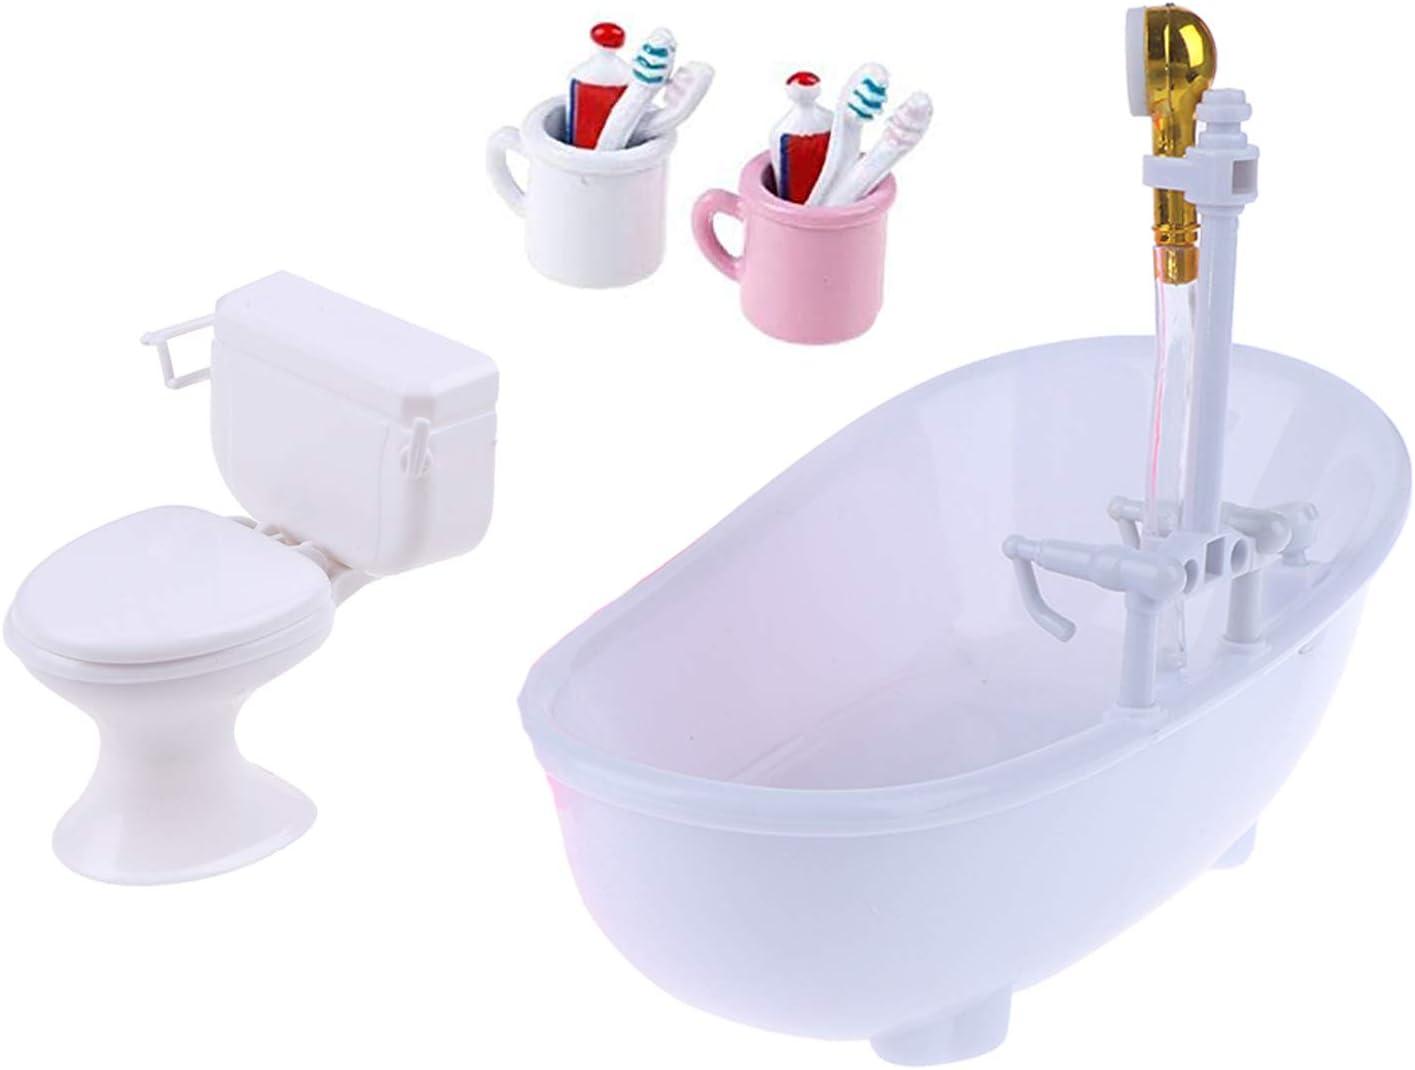 Welecom 1:12 Dollhouse Vintage Bathroom Bathtub Toilet 1/6 Dollhouse Miniatures Electric Bathtub with Spray Head Mini Toothbrush Toothpaste Cup Doll Tub Fairy House Furniture Kids Pretend Toys